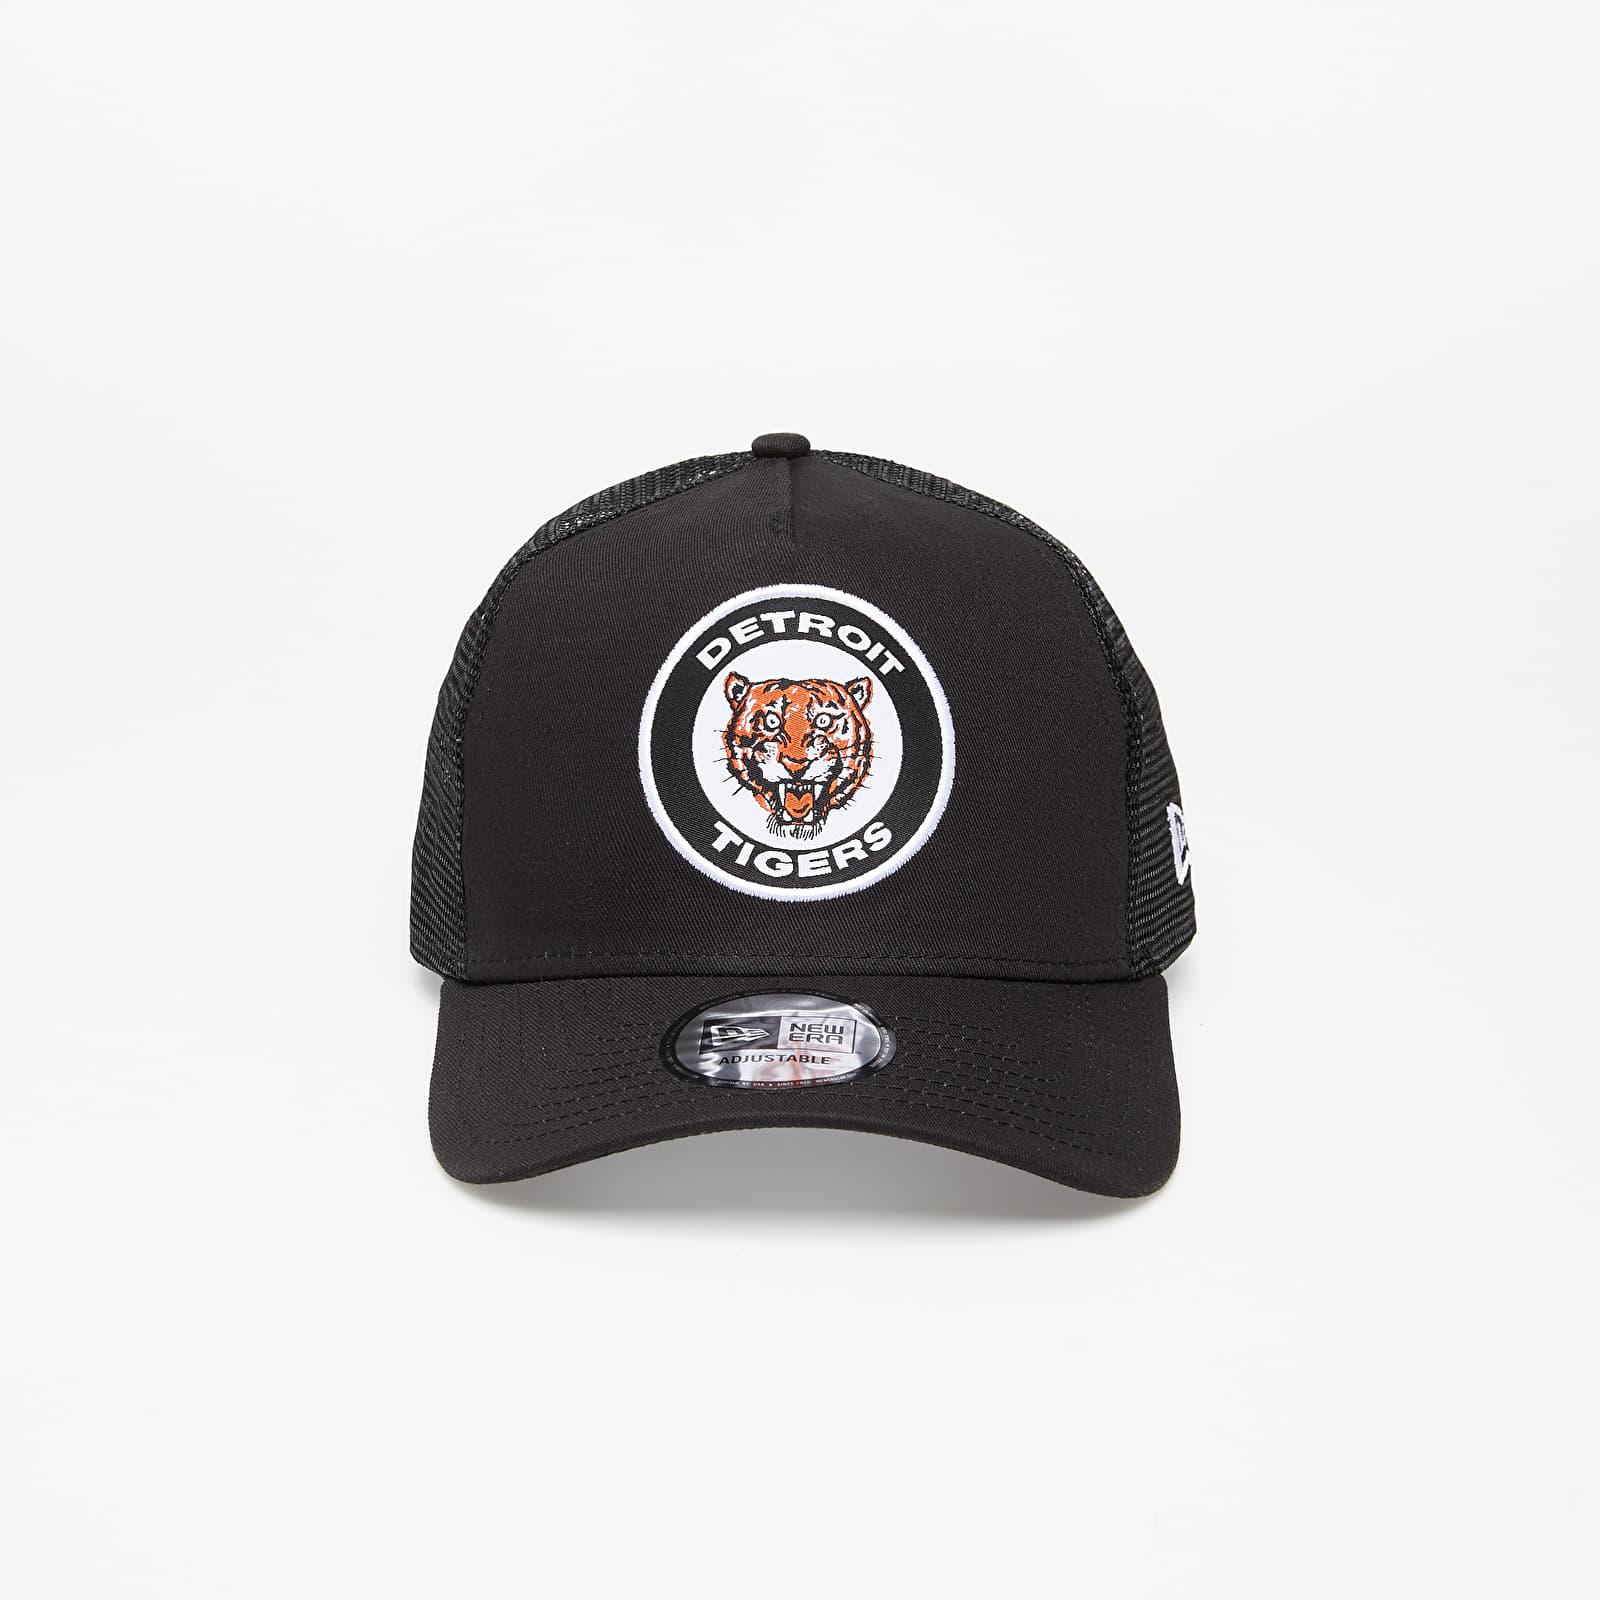 New Era 9Forty MLB Cooperstown Heritage Detroit Tigers A-Frame Trucker Cap Black univerzálna